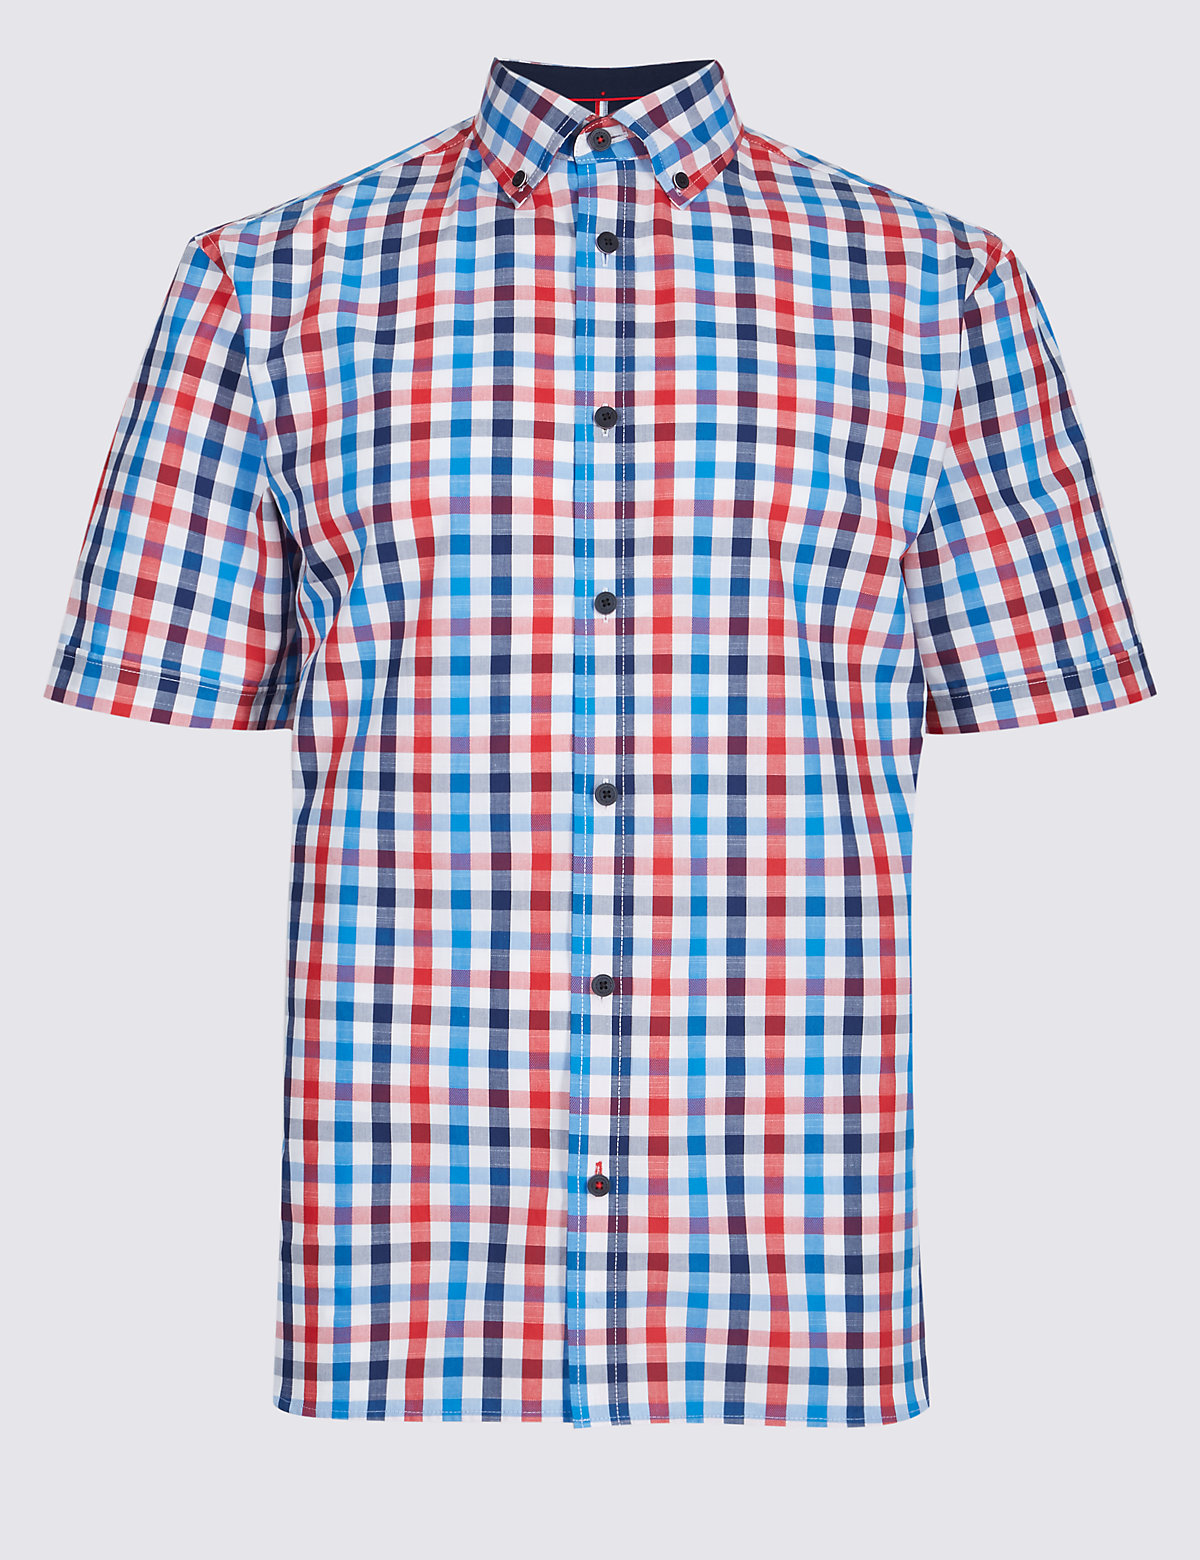 Mens Casual Shirts, Long & Short Sleeve Shirts For Men | M&S